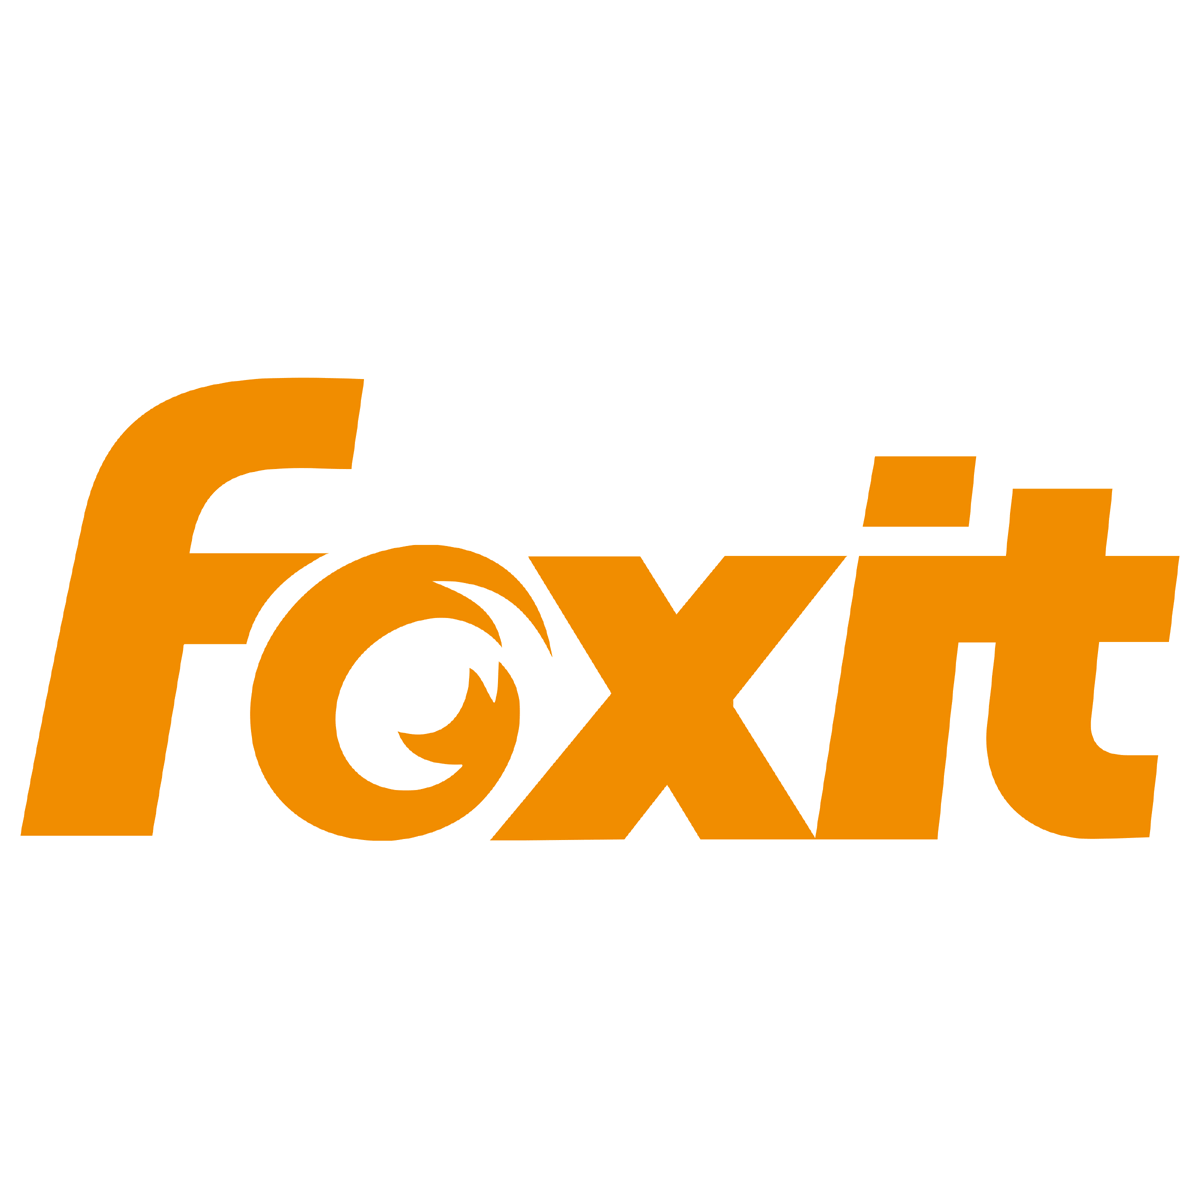 foxit-logo